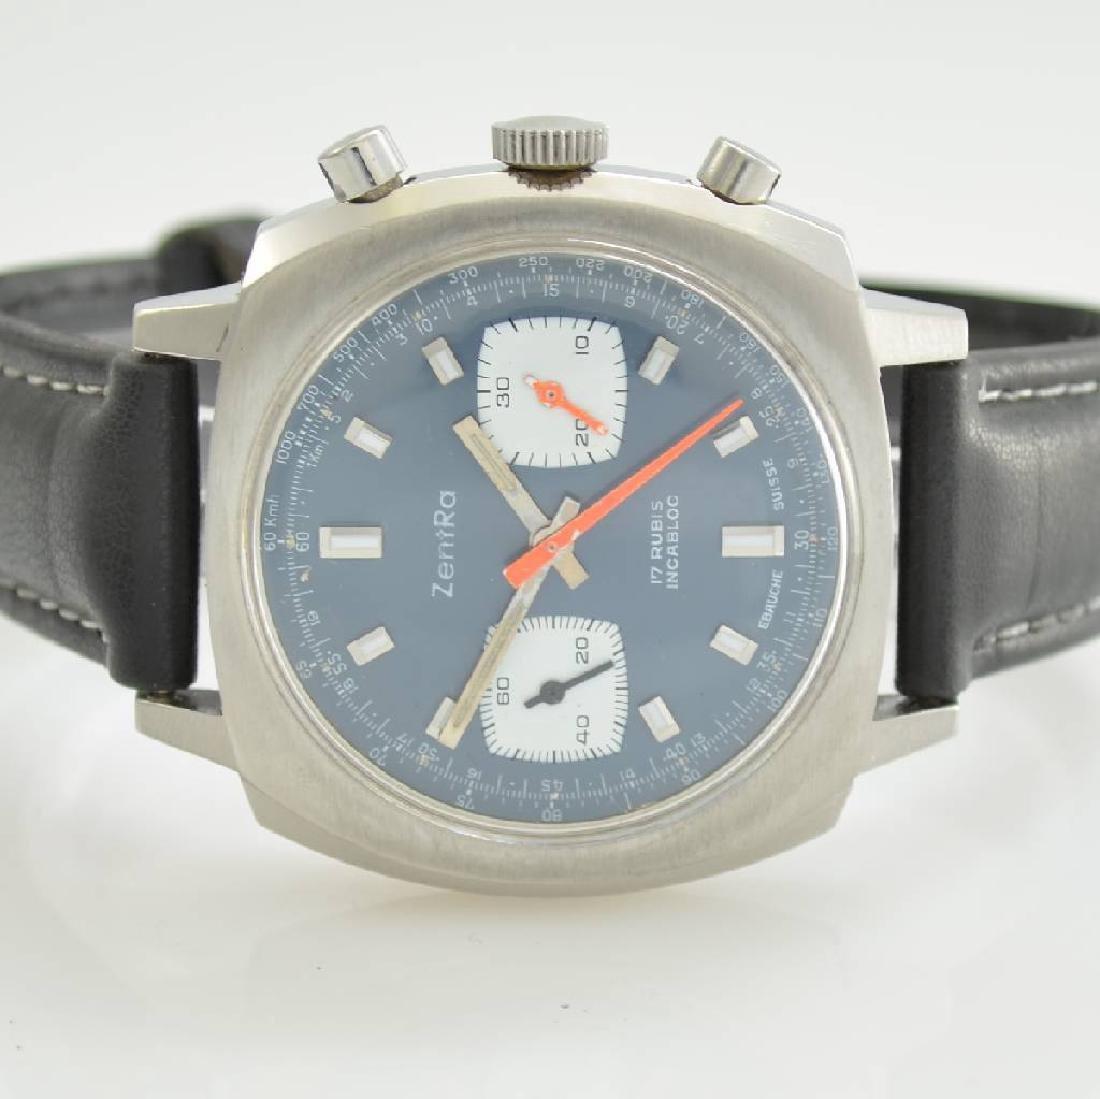 ZENTRA chronograph, Switzerland around 1970 - 2